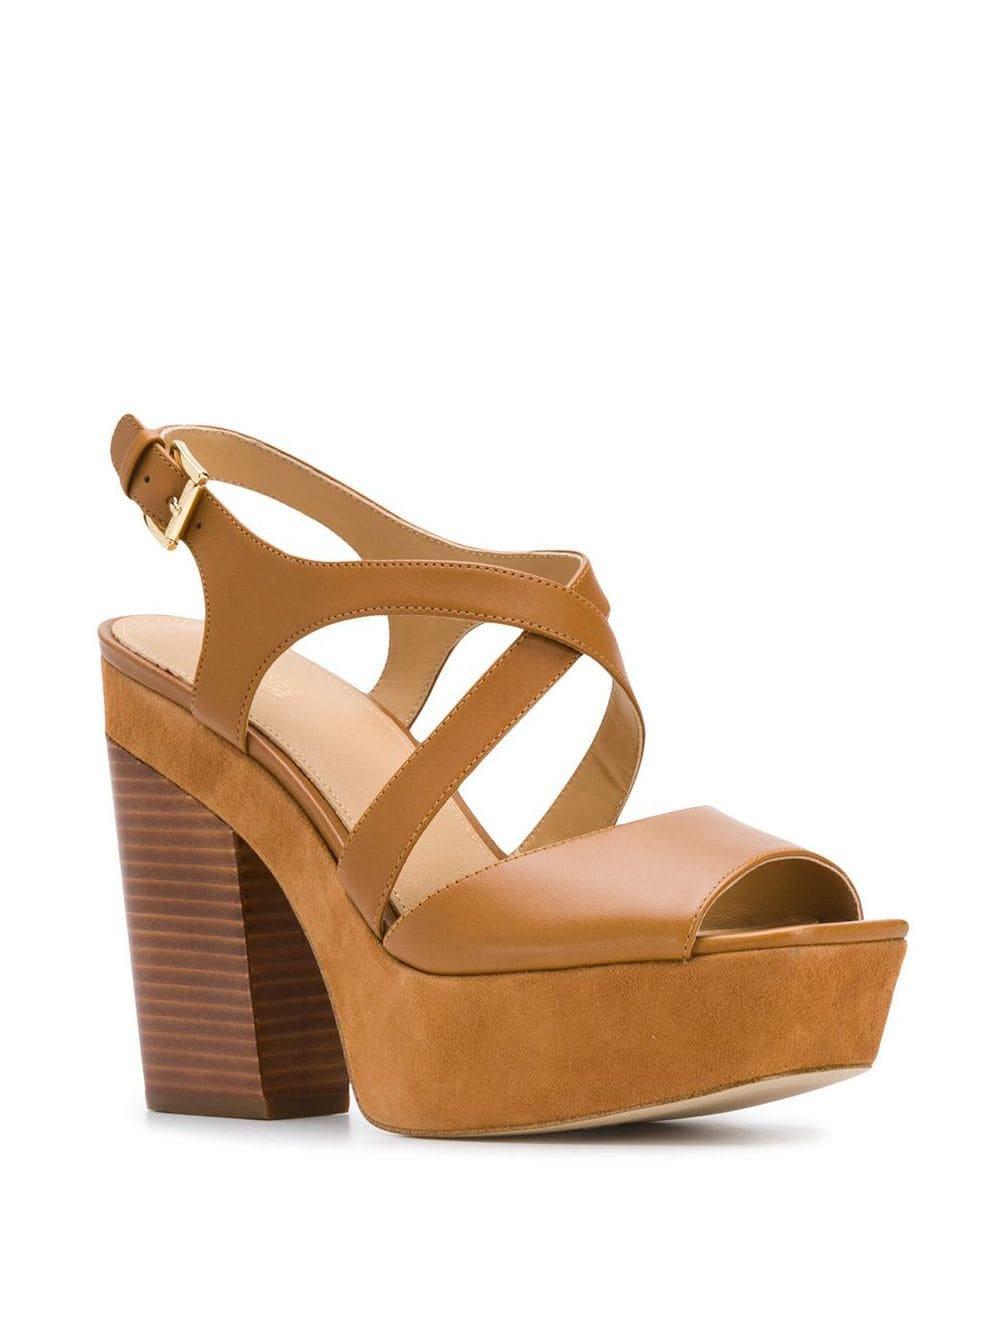 Michael Michael Kors Wedge Sandals | Farfetch.com